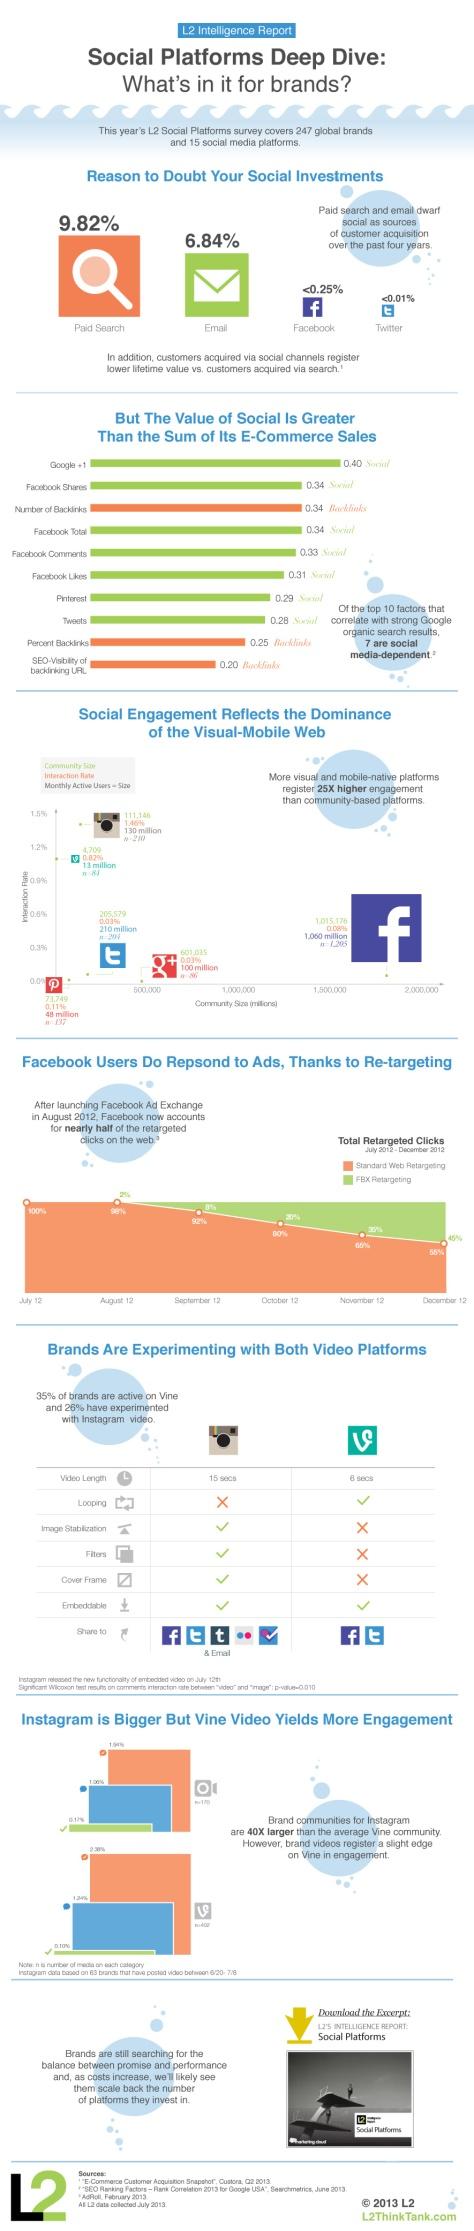 Social Platforms Deep Dive